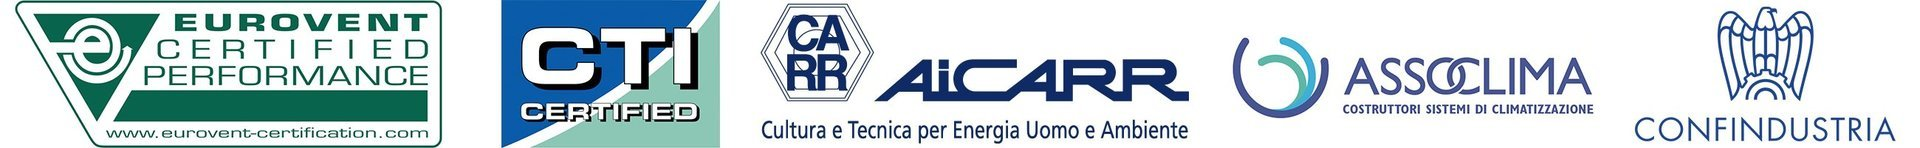 Logo - CTI  ALCARR  ASSCCLIMA